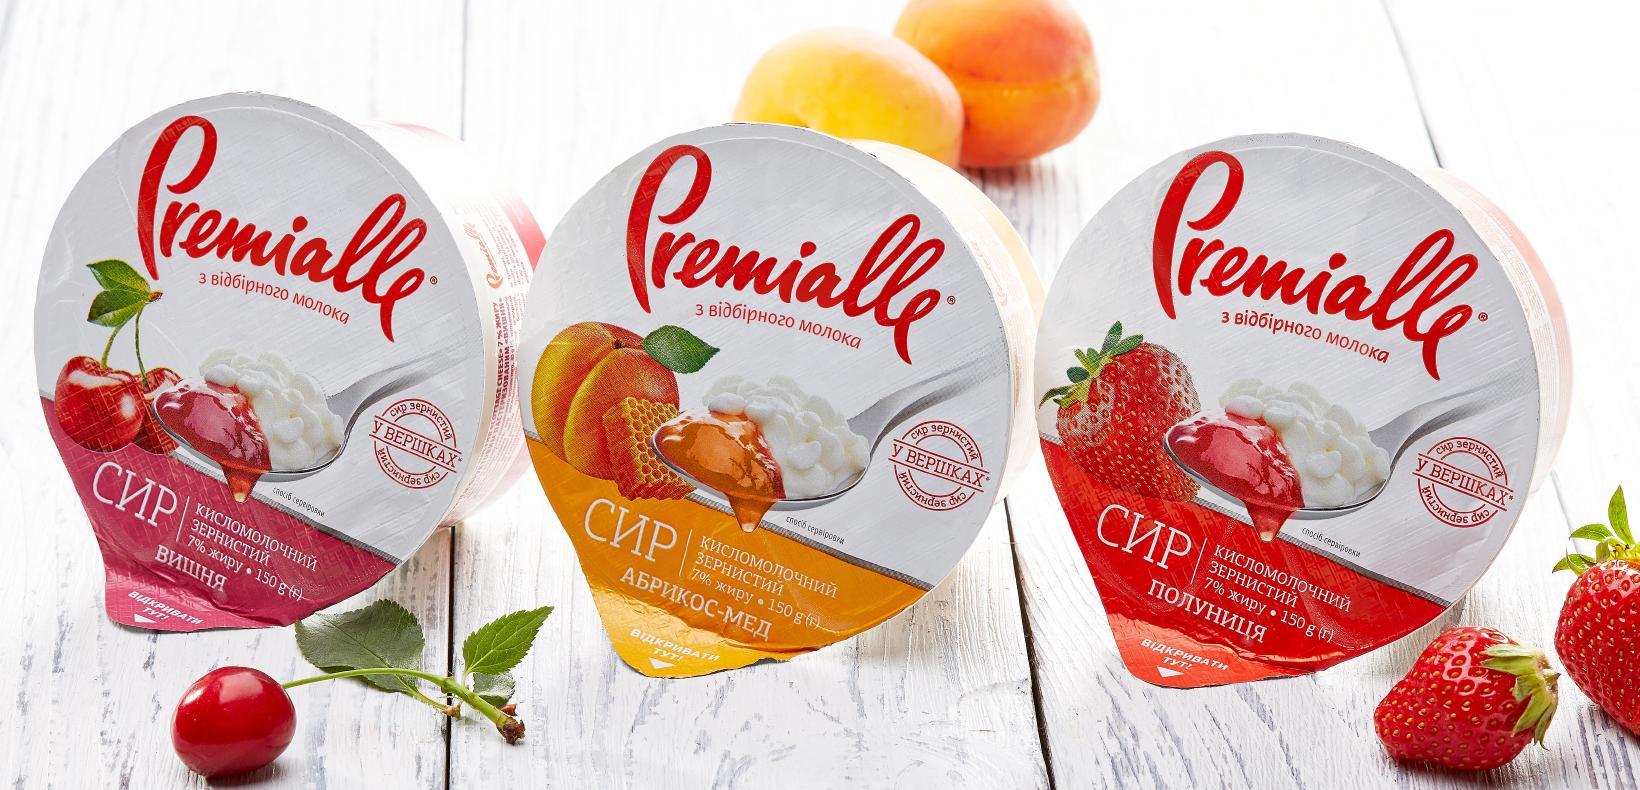 упаковка зернистого сыра с дежмом Premialle